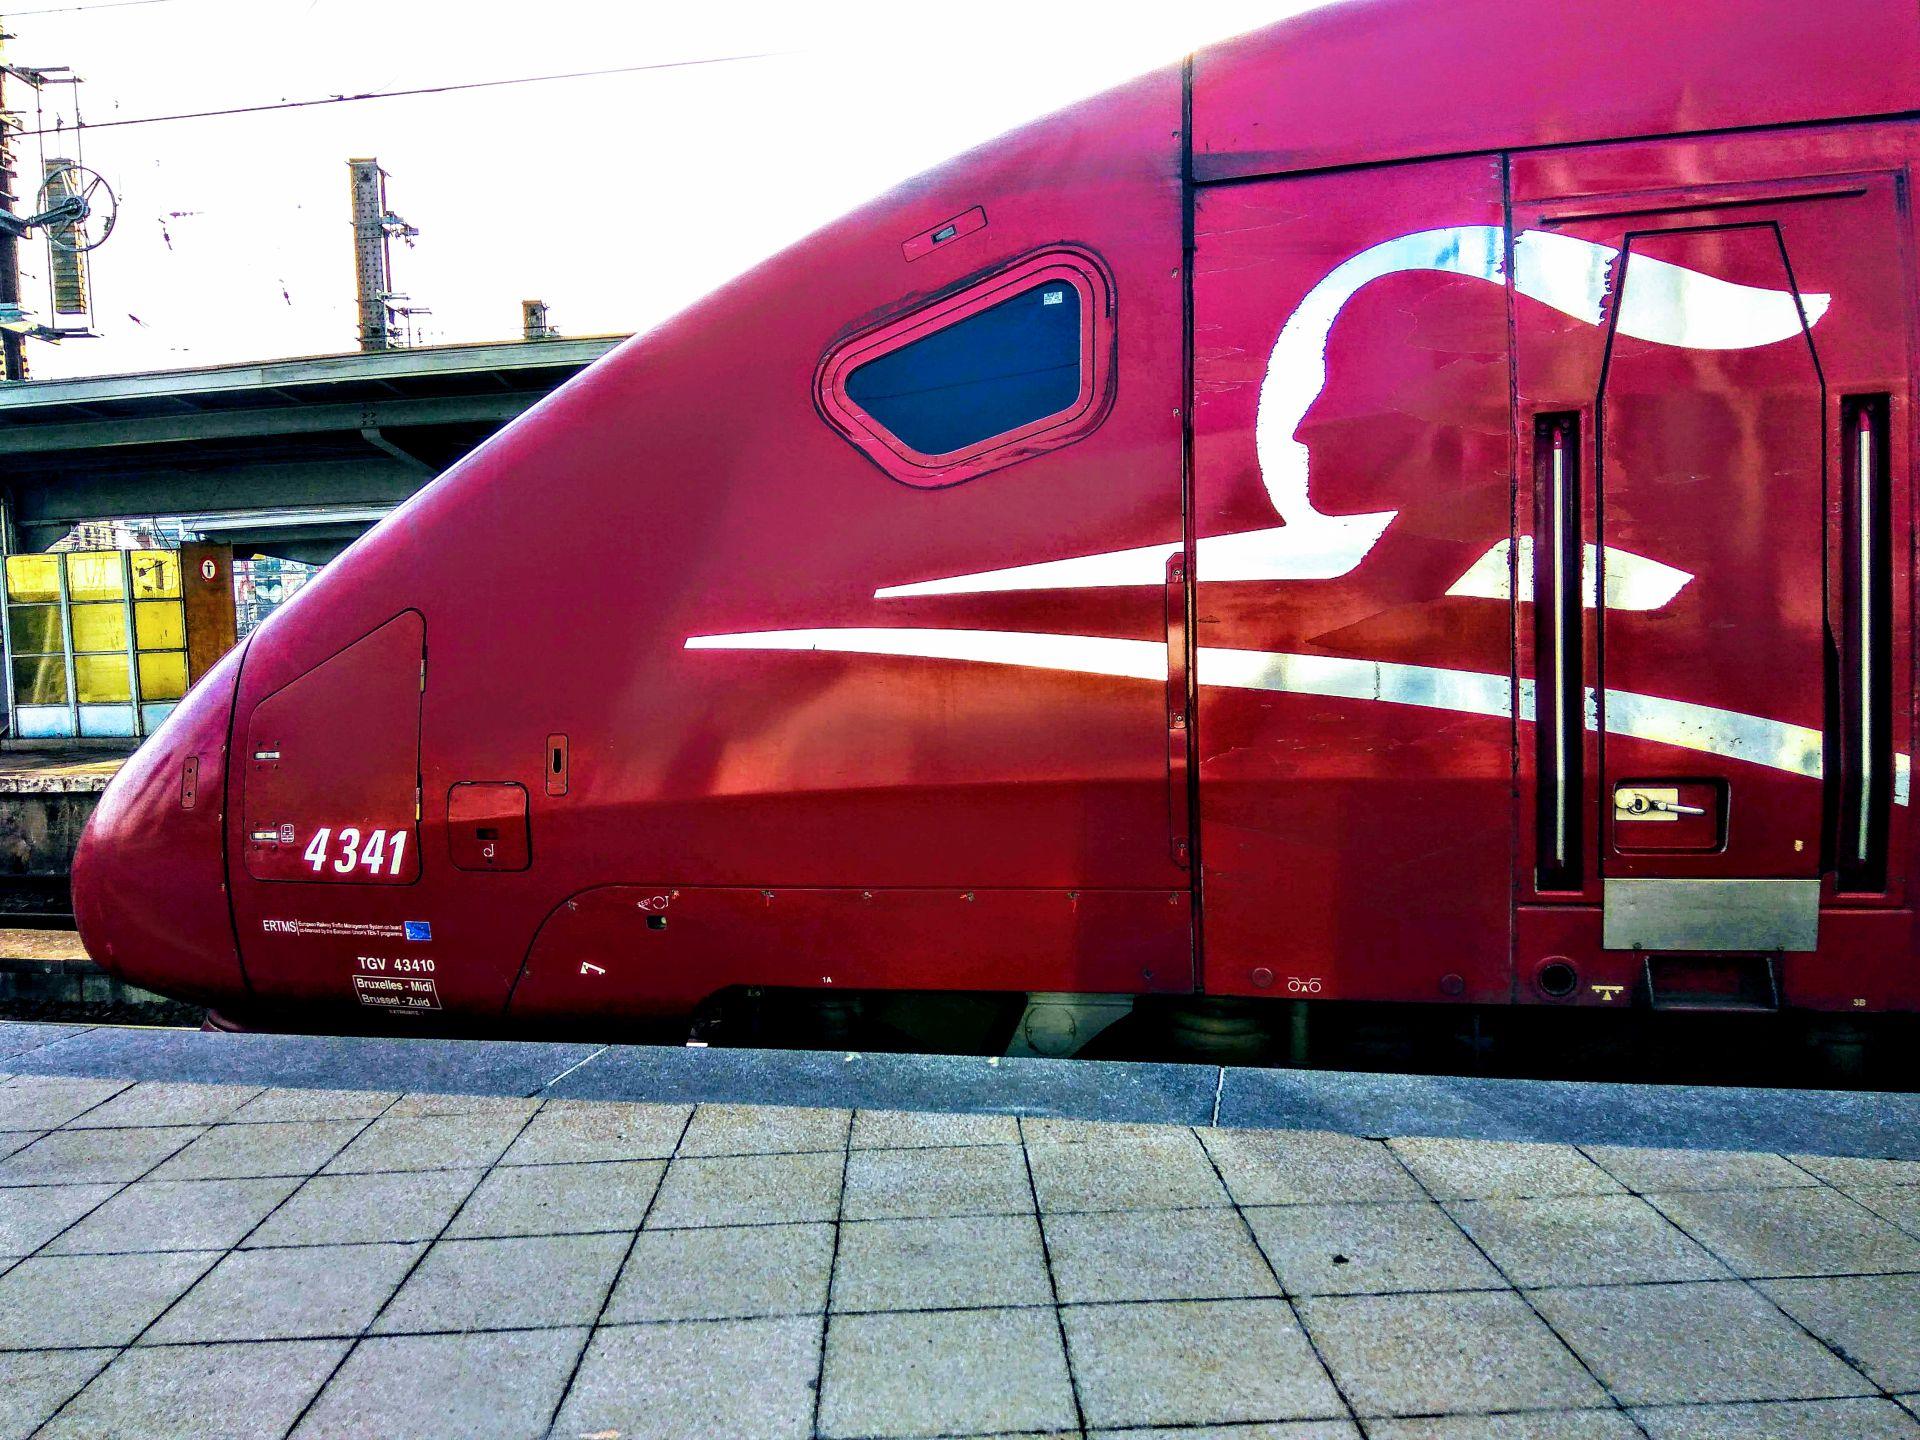 Jednotka Thalys PBKA na nádraží v Bruselu. Foto: Jan Sůra